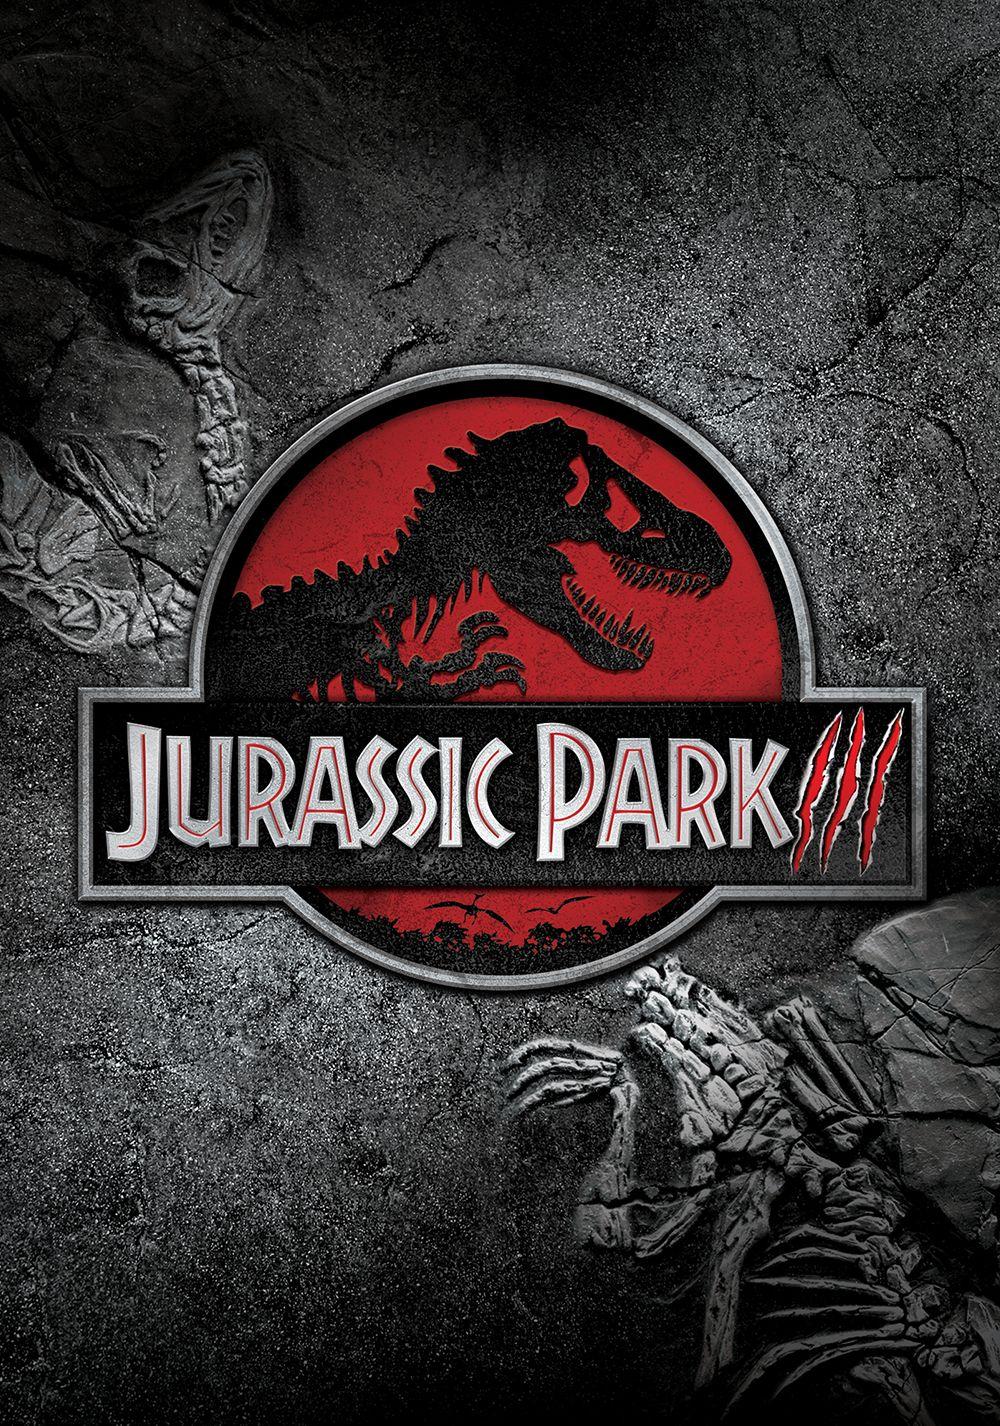 Jurassic Park Parque Jurásico III poster box cover